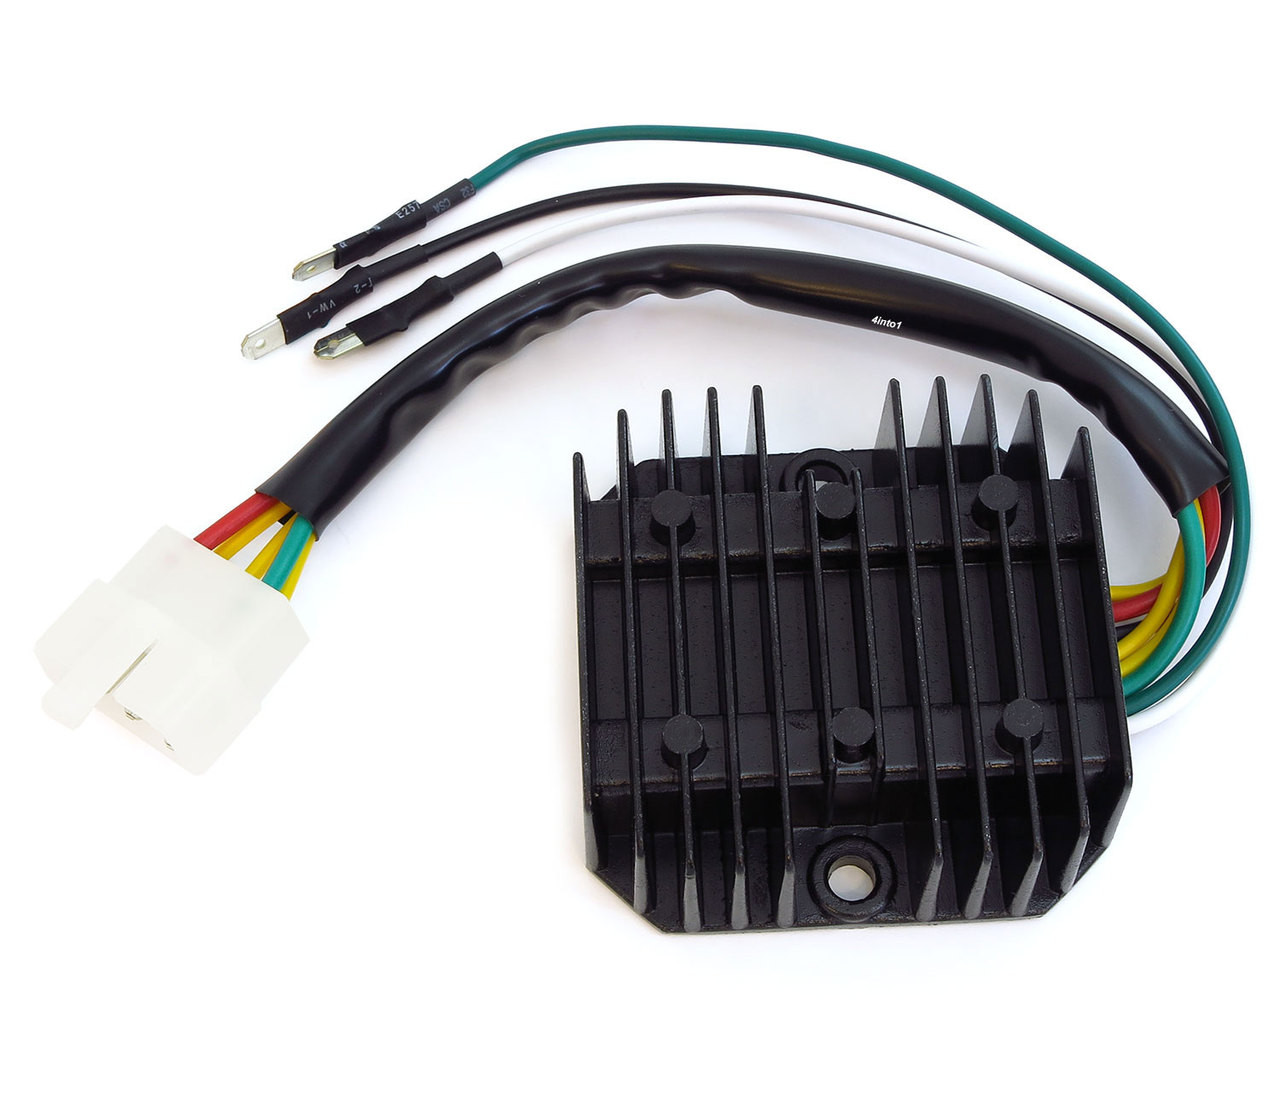 regulator rectifier honda cb350f cb400f cb500 cb550 cb750 rh 4into1 com 4 Wire Regulator Wiring Diagram Kawasaki Rectifier Wiring